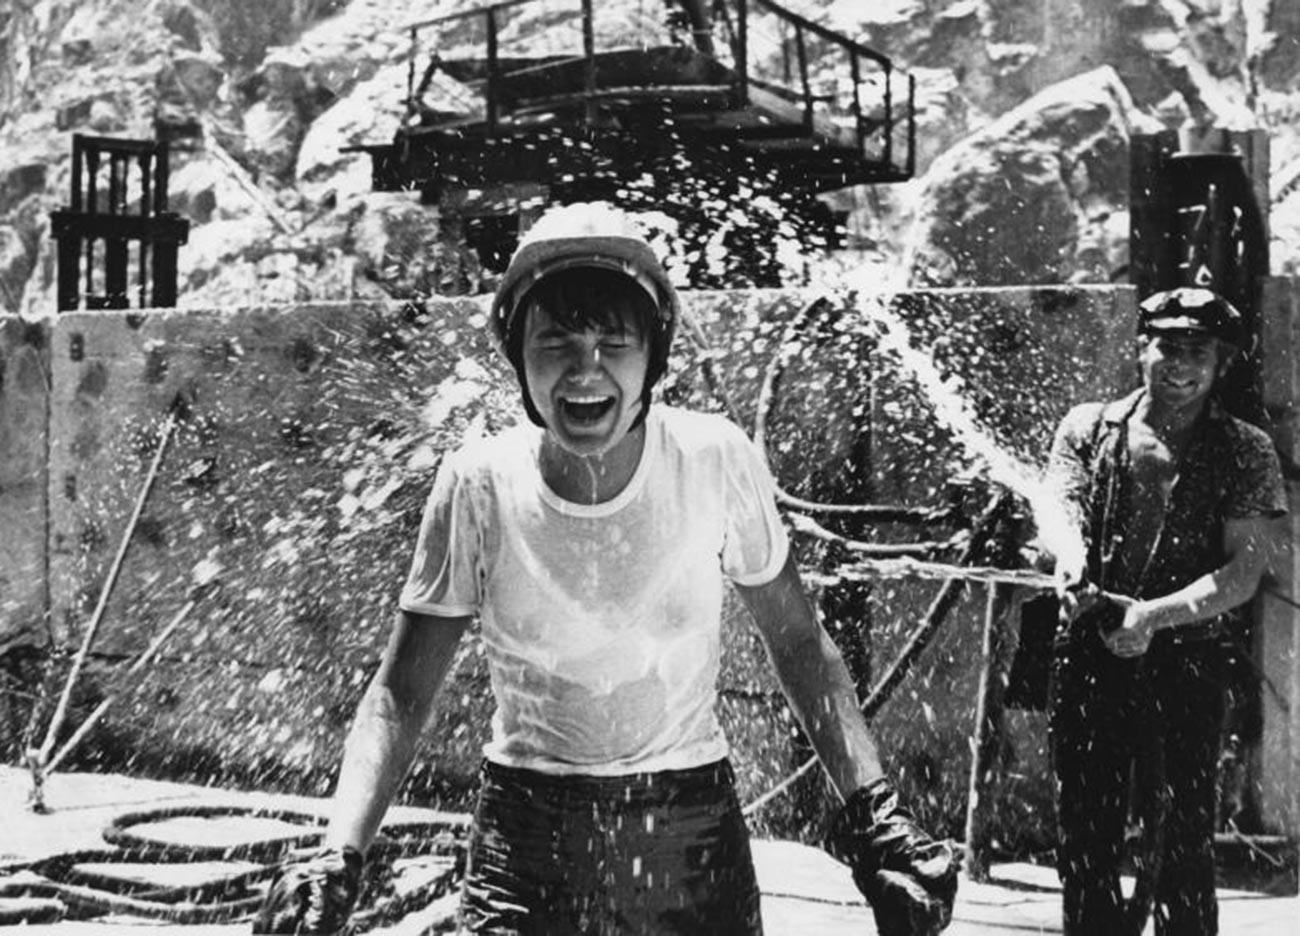 Chantier du barrage de Toktogul, Kirghizstan, 1975-1976